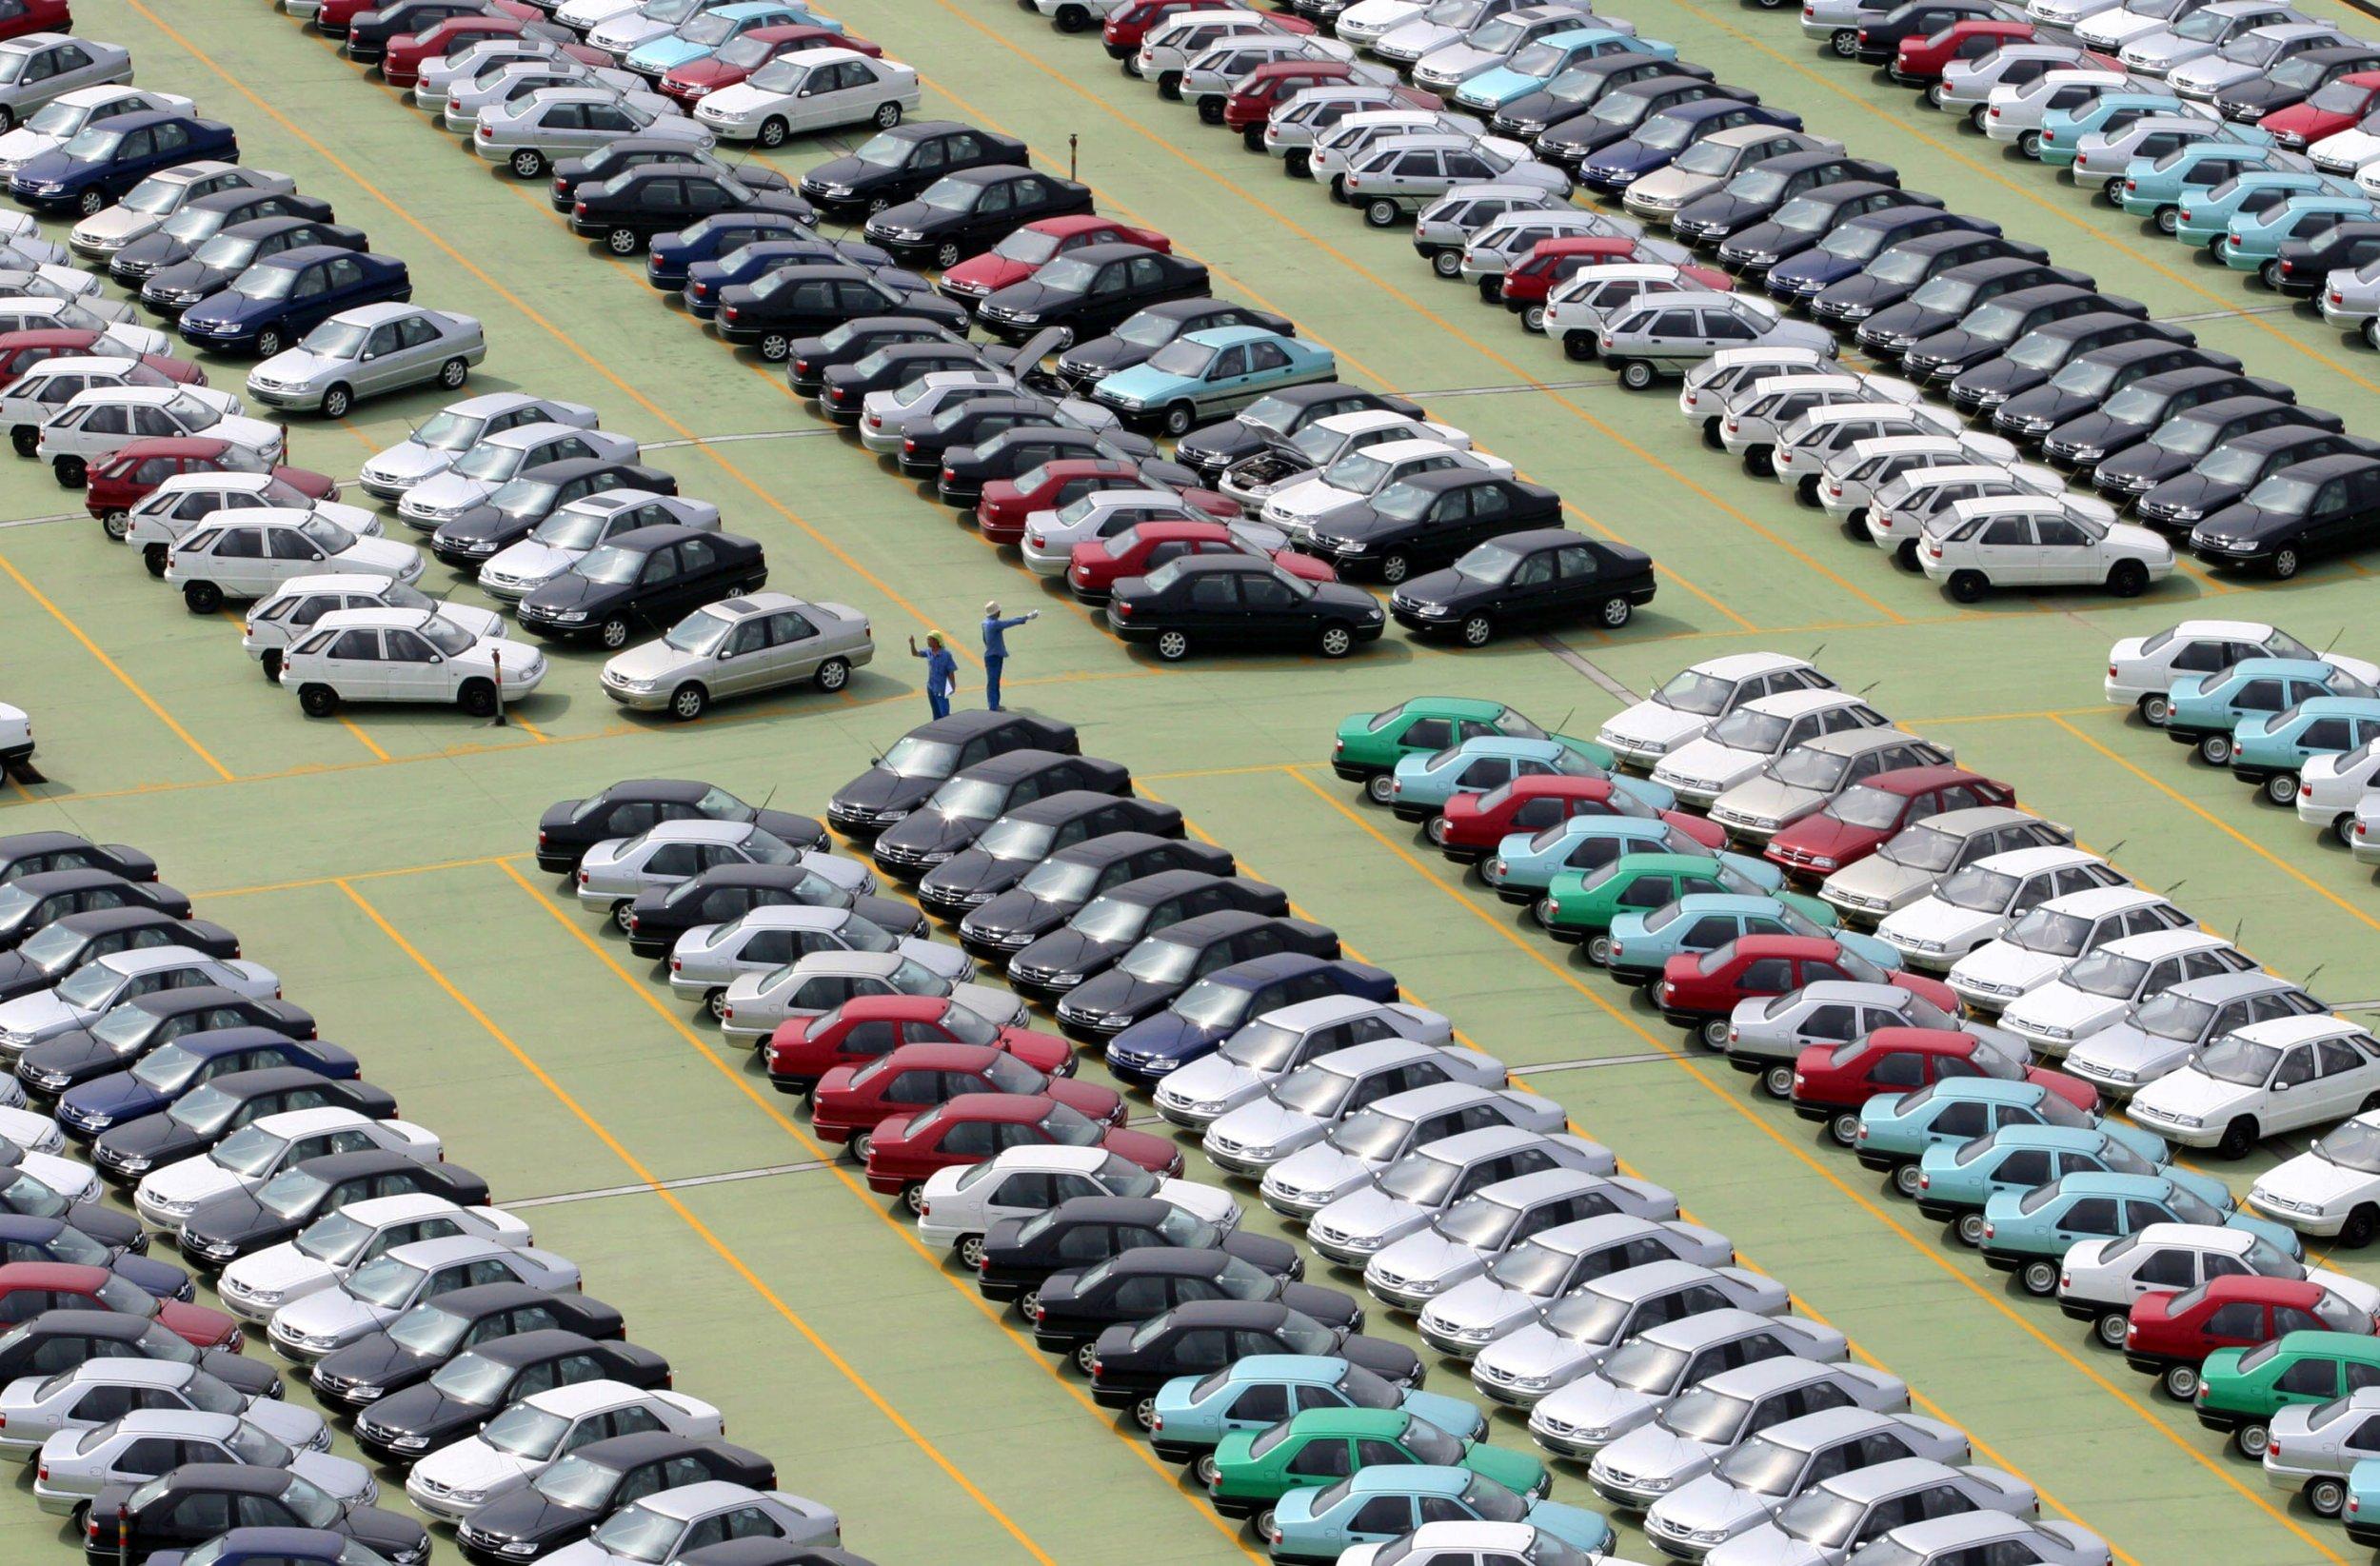 01_23_parking_01